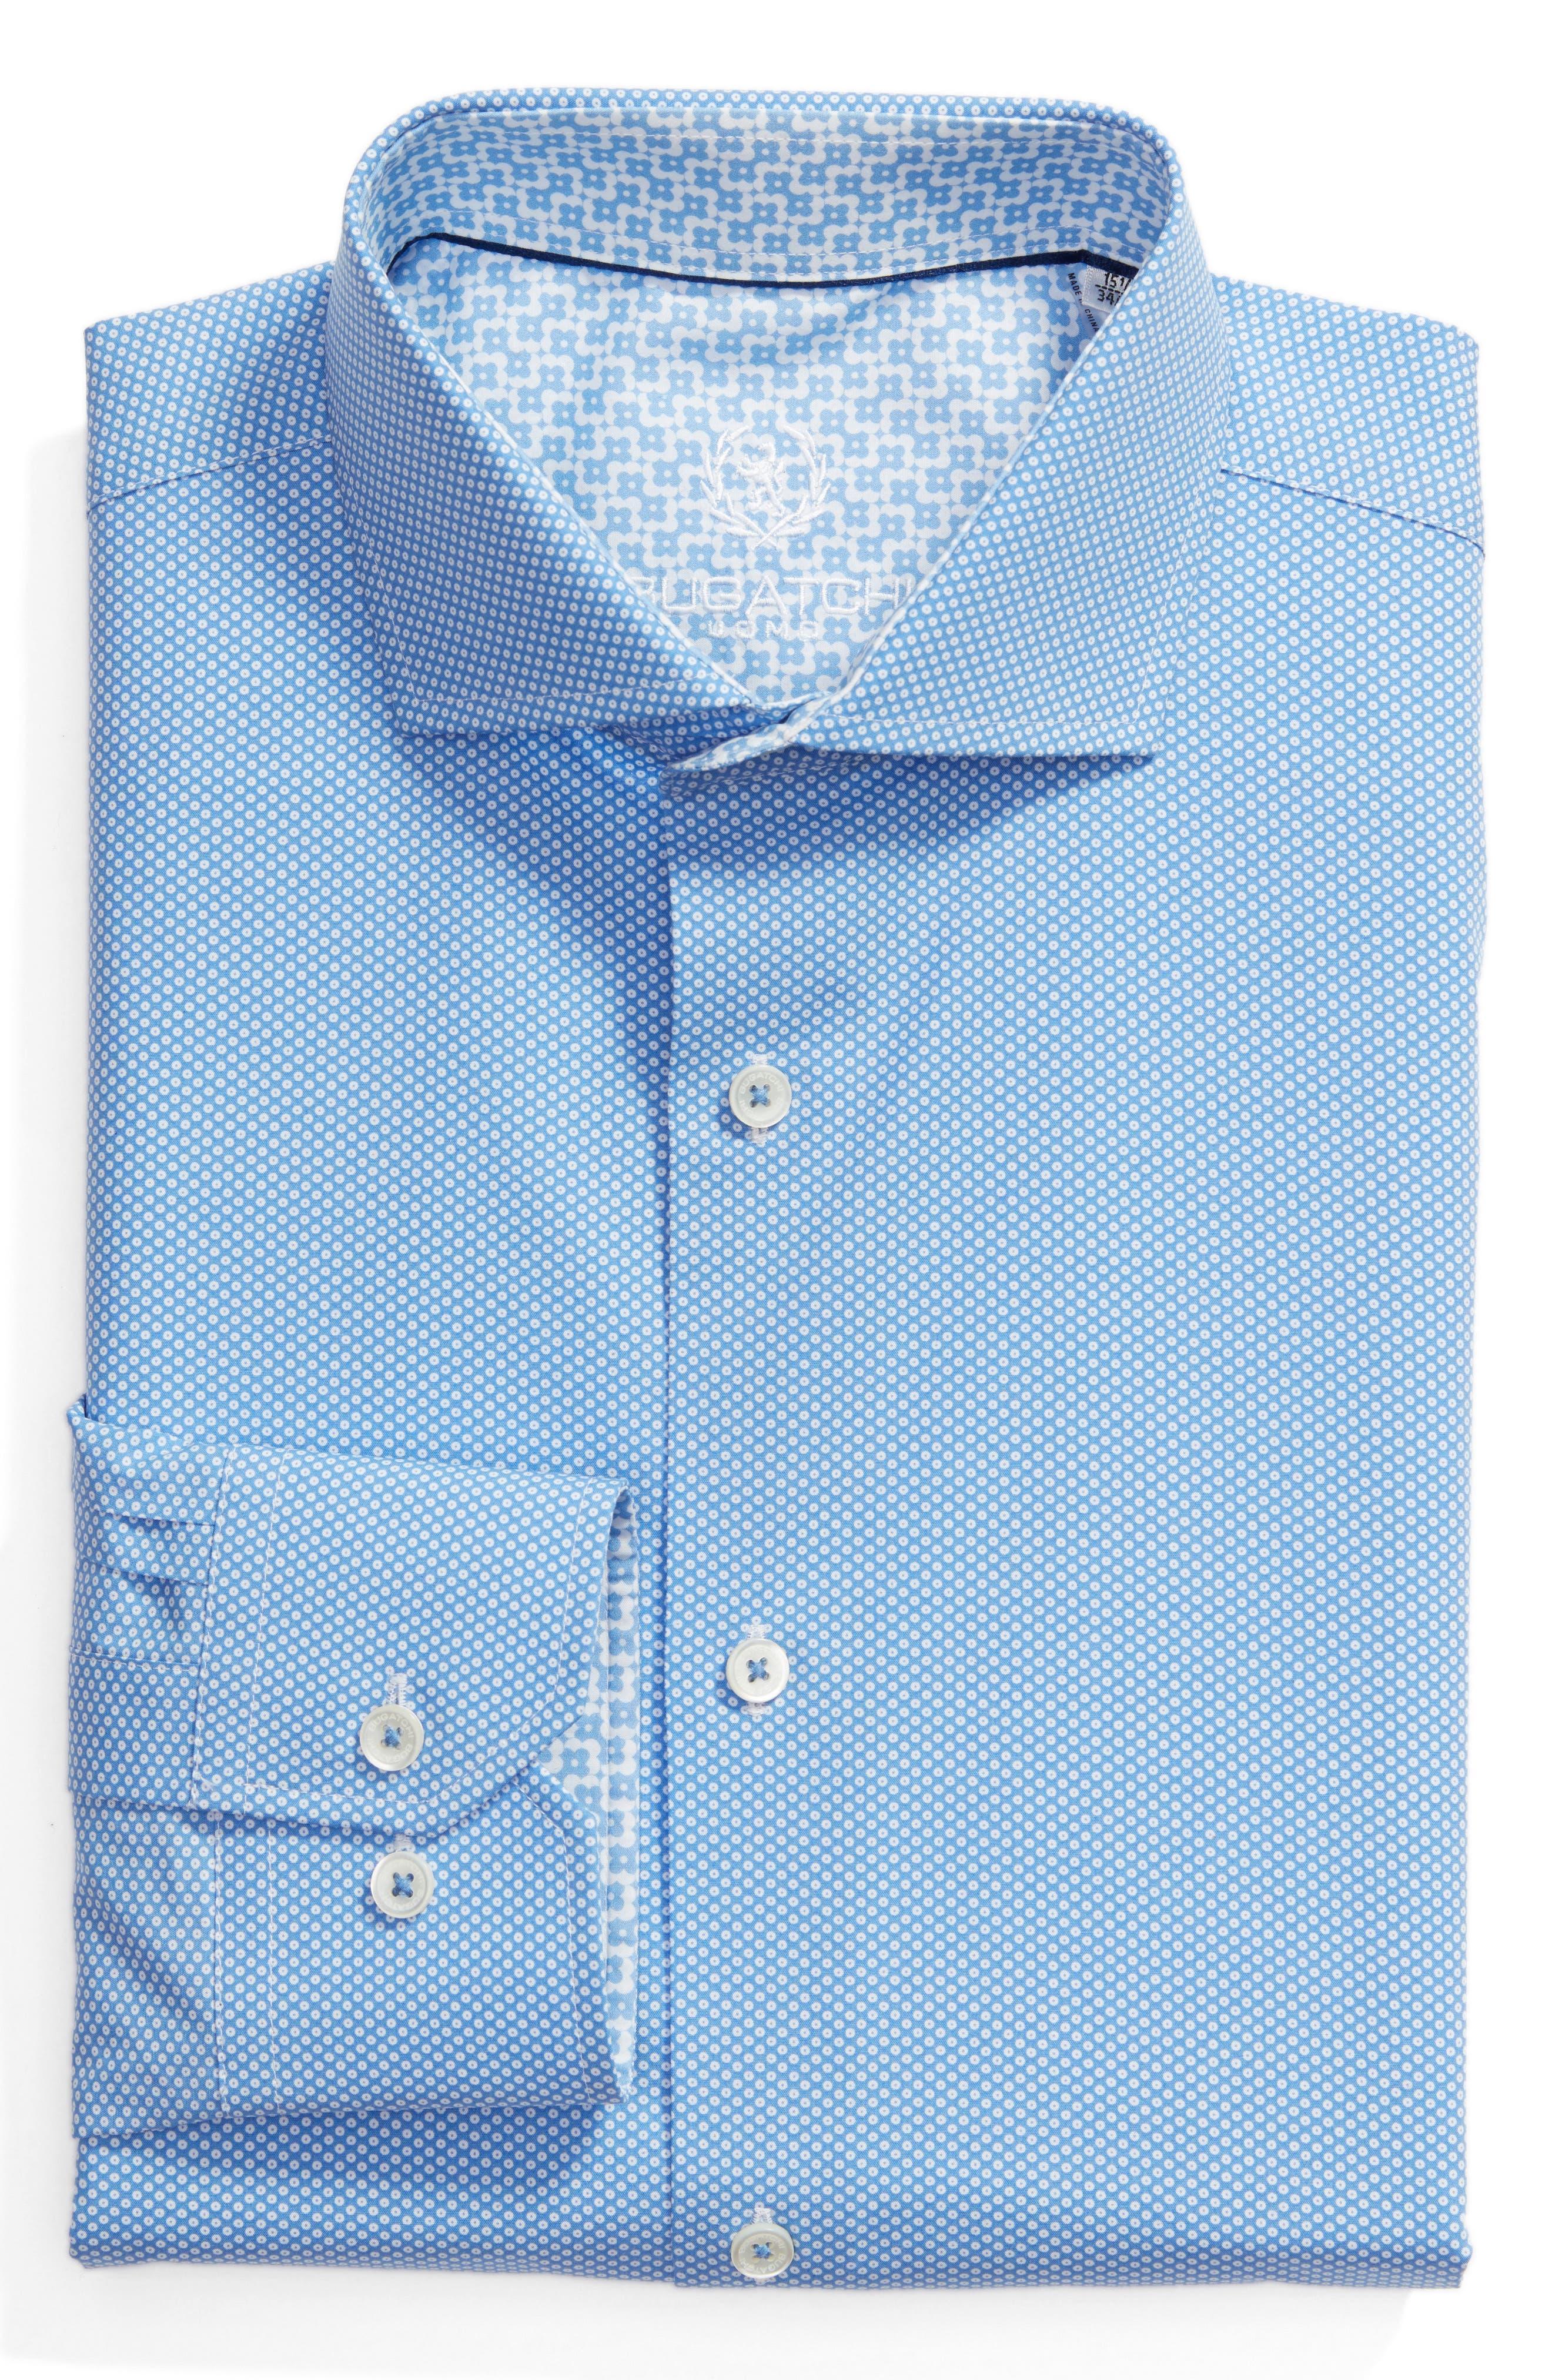 Alternate Image 1 Selected - Bugatchi Trim Fit Print Dress Shirt